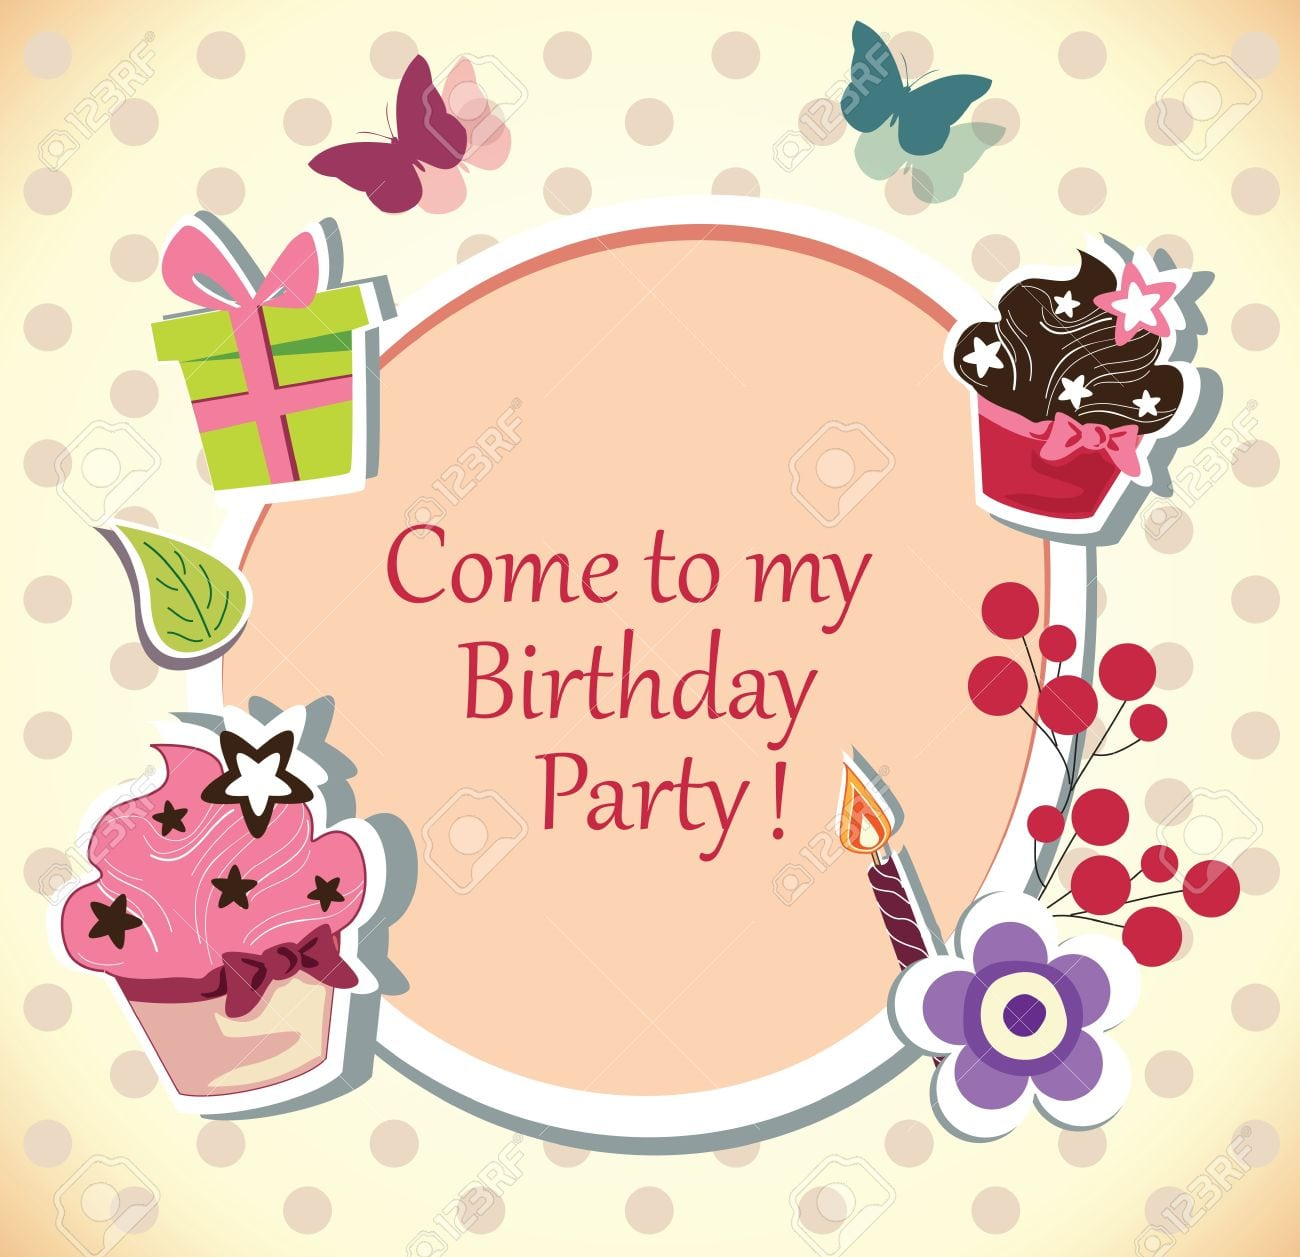 Birthday Party Invitation Card Royalty Free Cliparts, Vectors, And